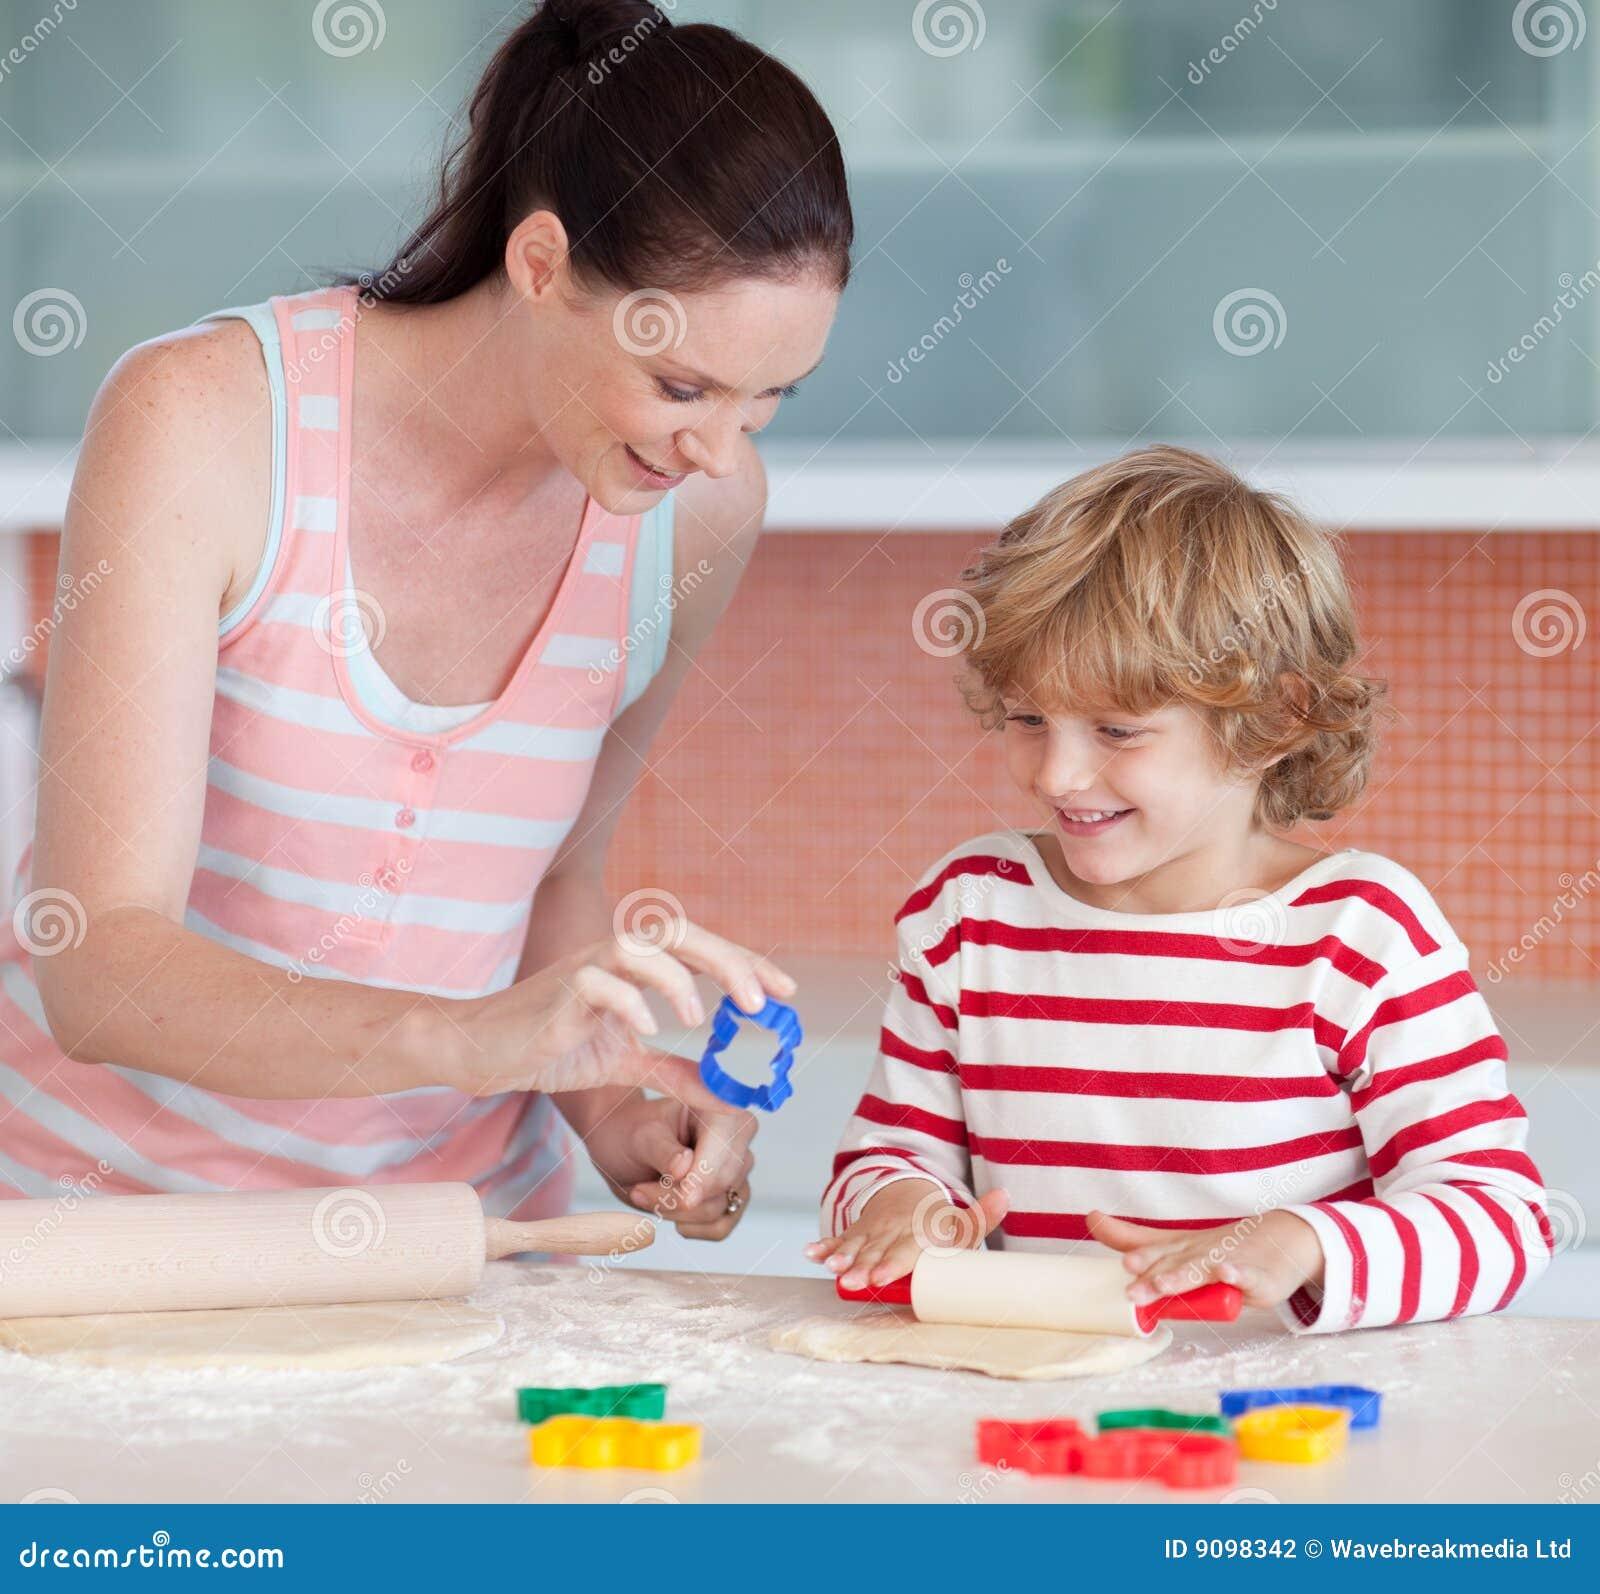 Сын с матерью на кухне 1 фотография